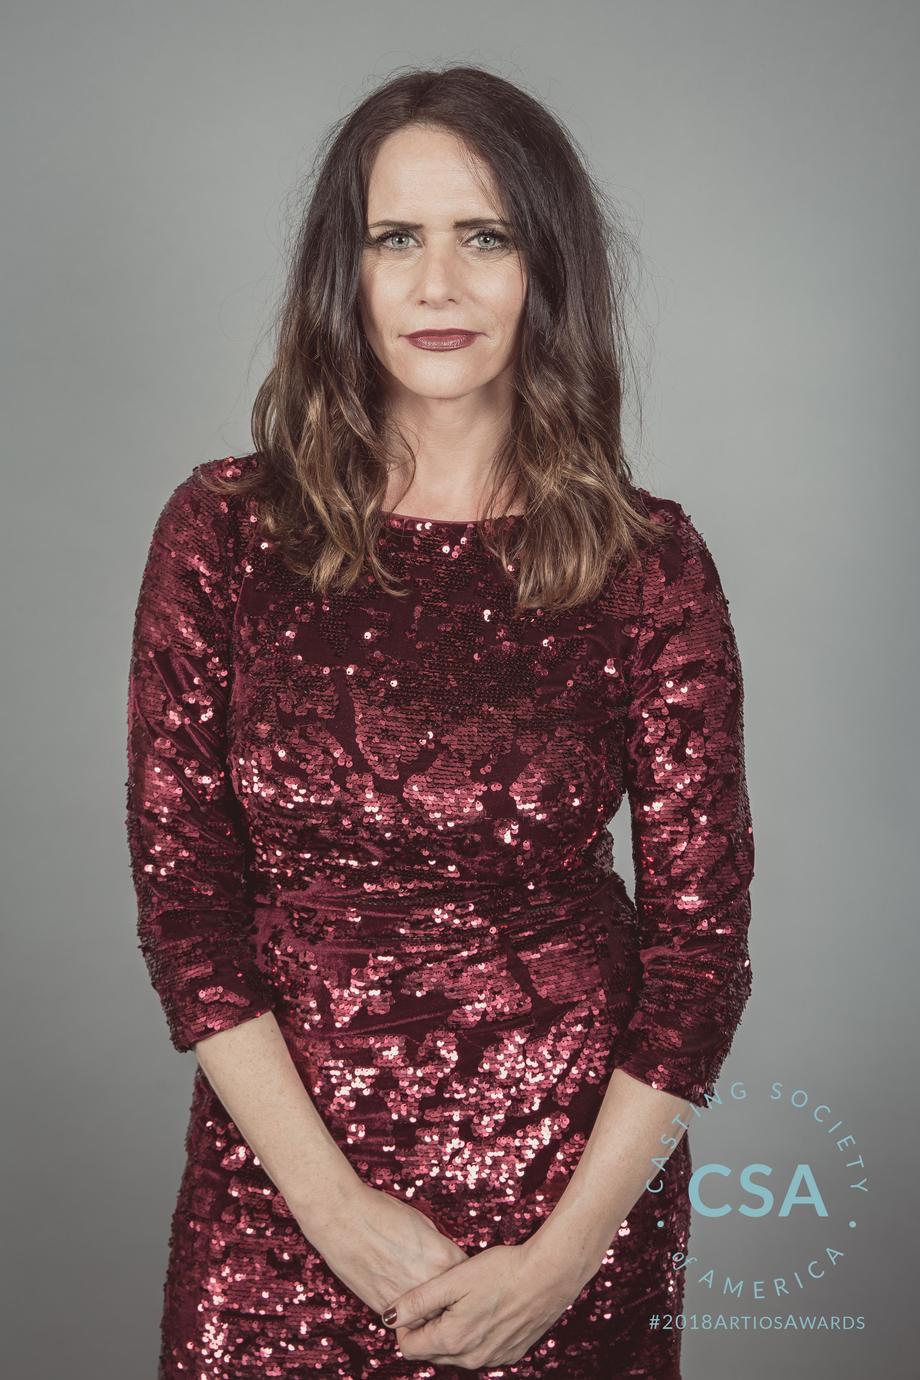 Presenter Amy Landecker - photo credit: Lisa Kelly Remerowski